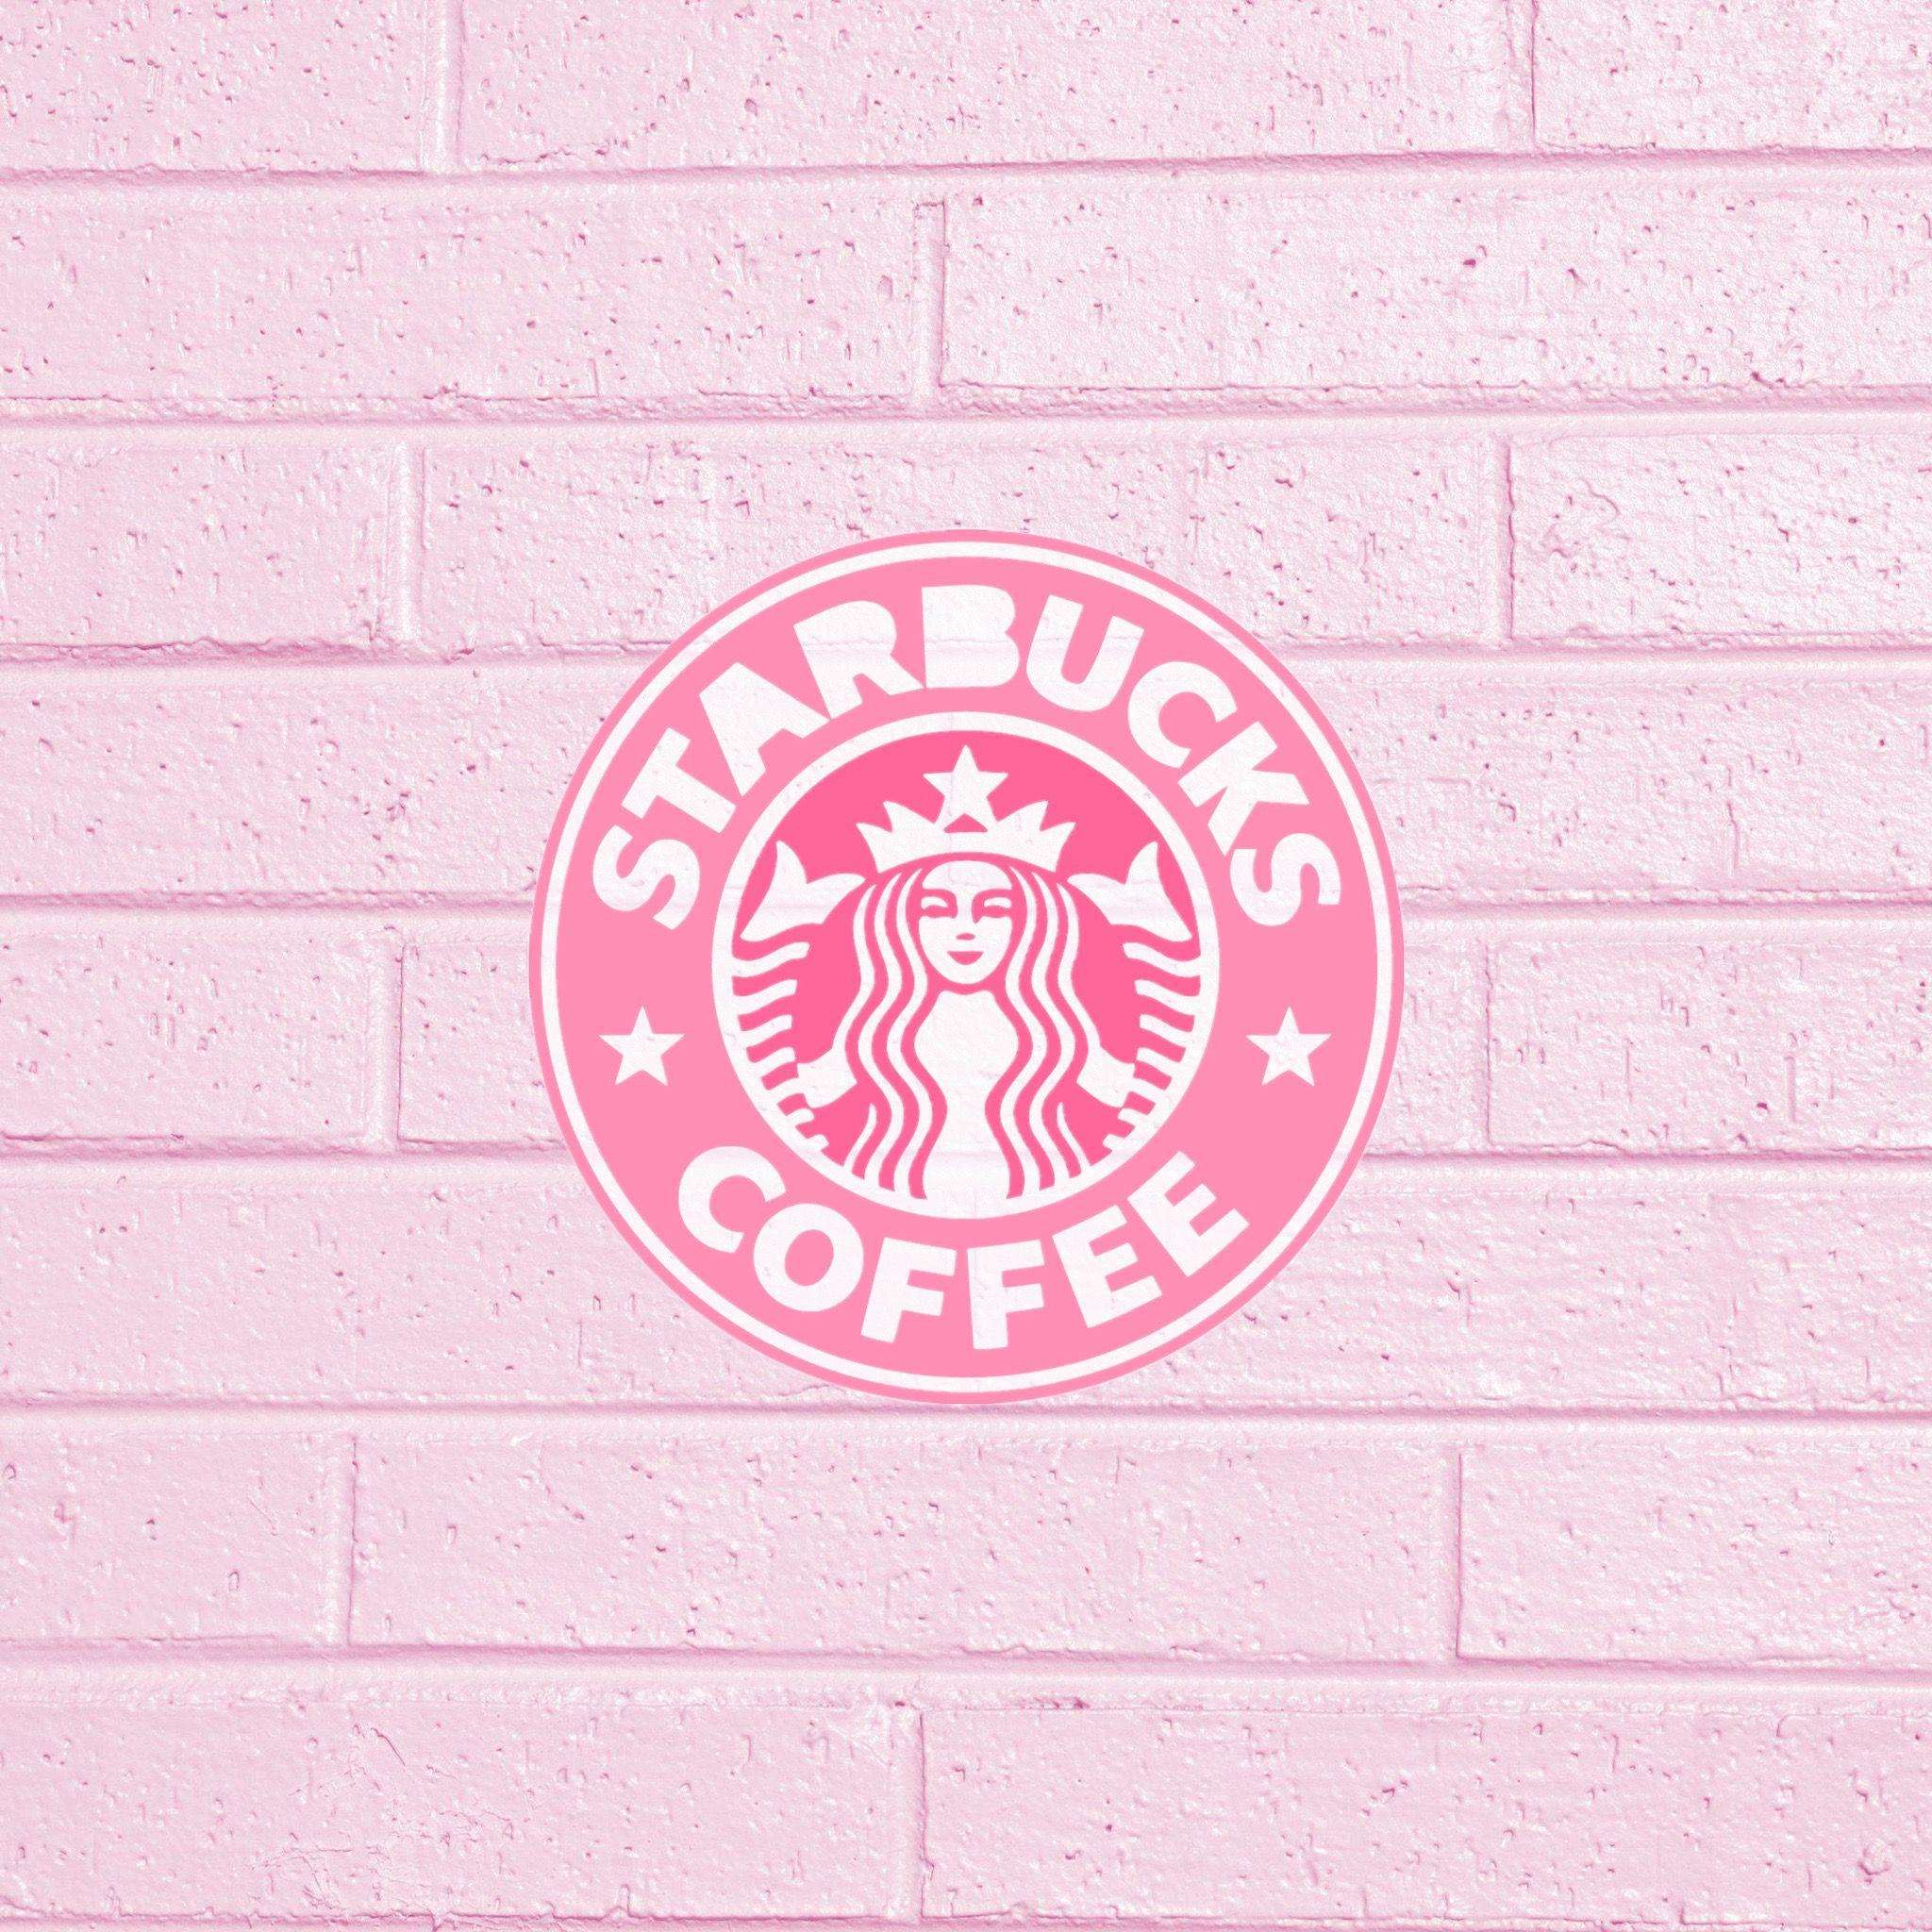 Starbucks Wallpaper Hd Walpapers Starbucks Wallpaper